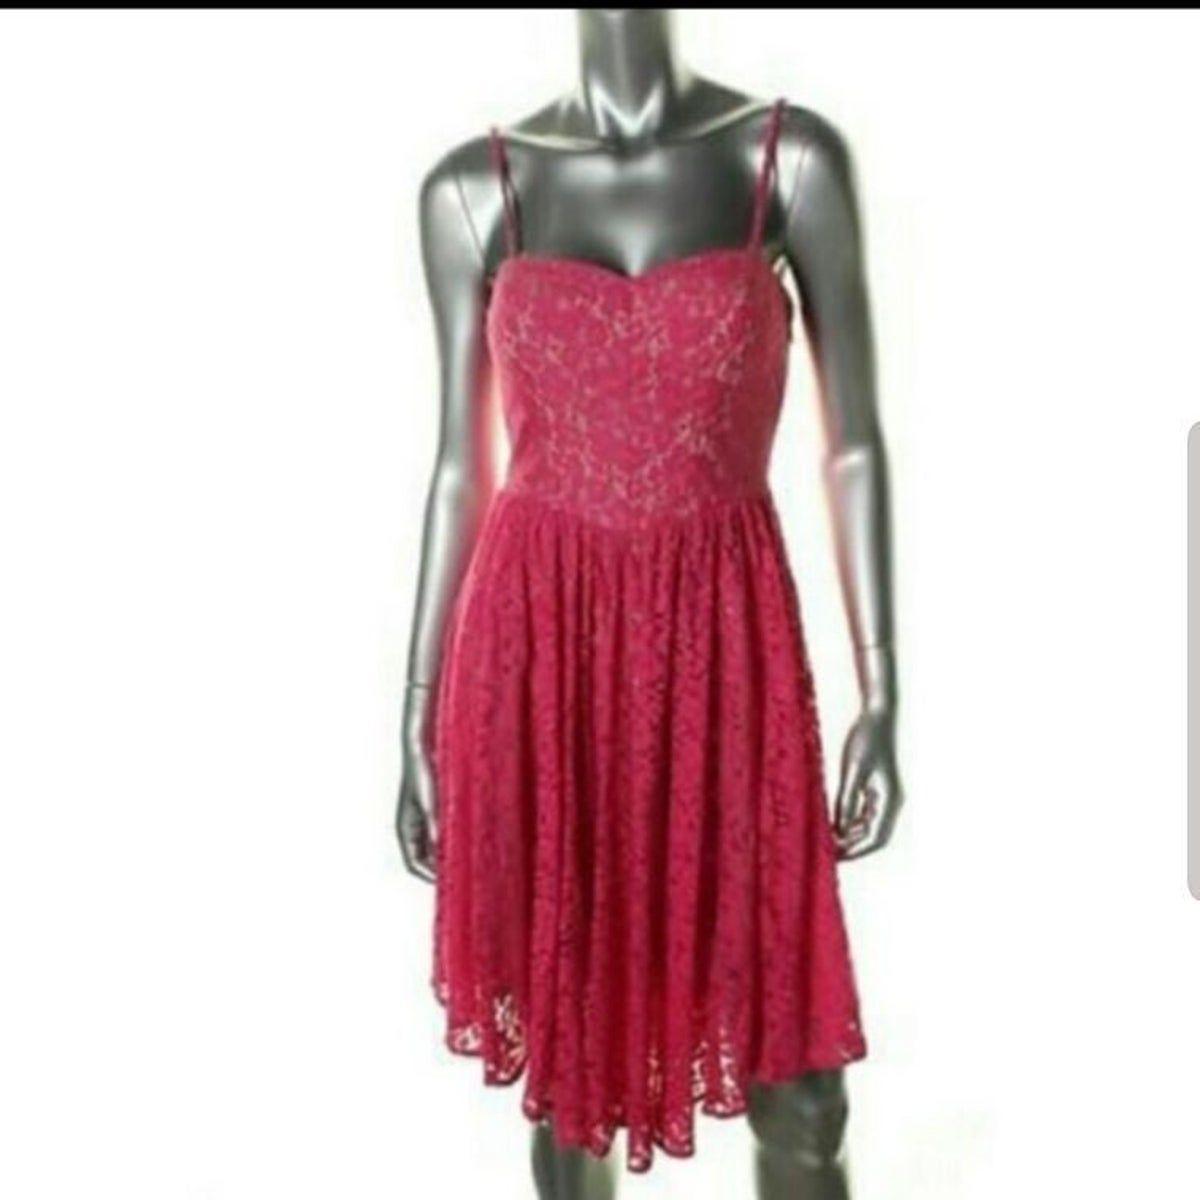 Betsey Johnson pink lace dress 10 NWT #rosaspitzenkleider